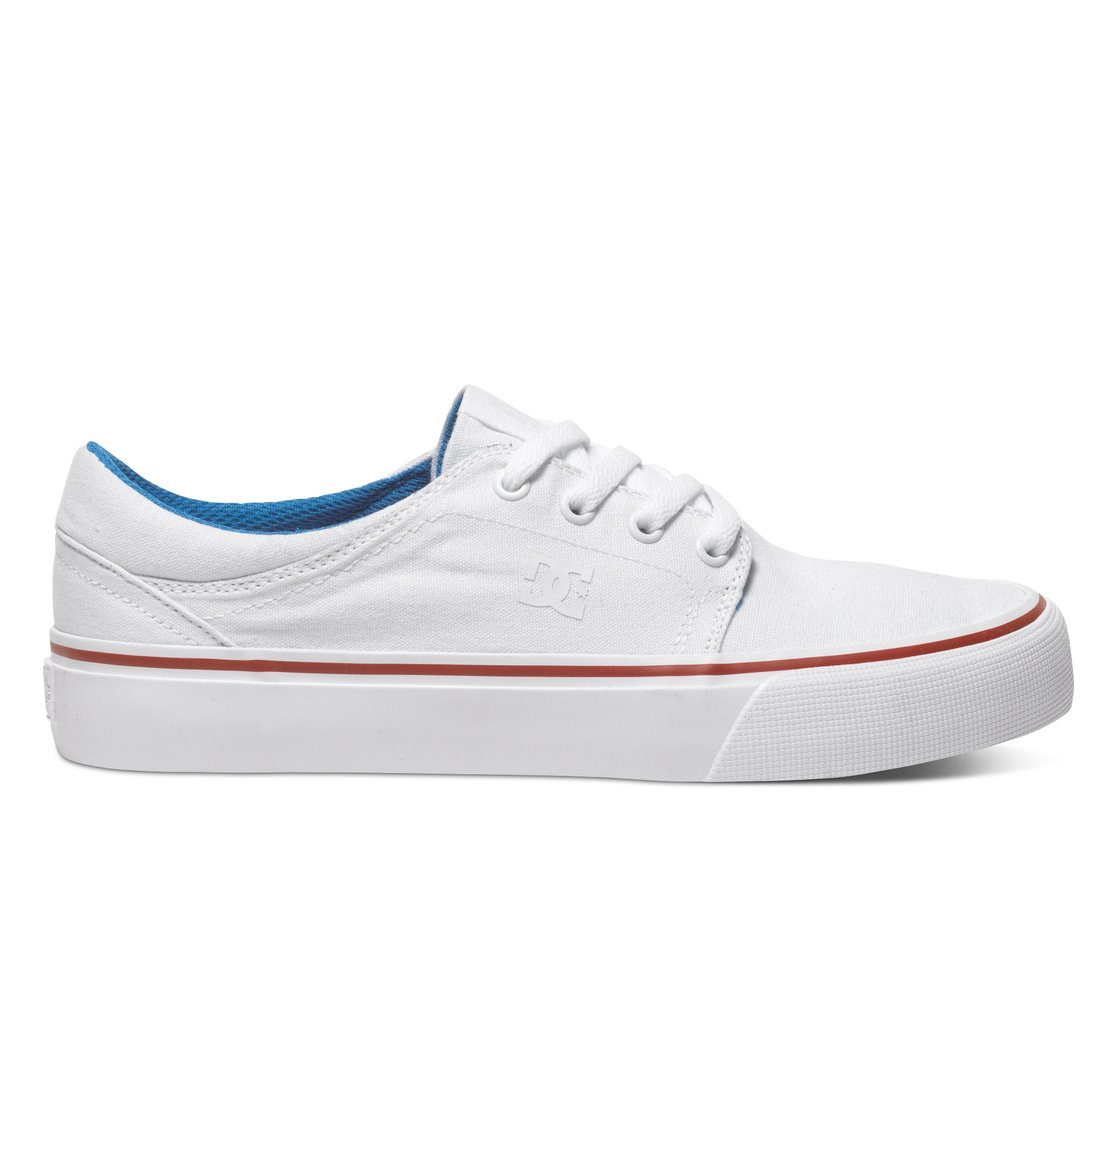 Awesome Sneakers Women S Women S Shoes Shoe S Boots Dc Shoes Shoes Shoes Shoes